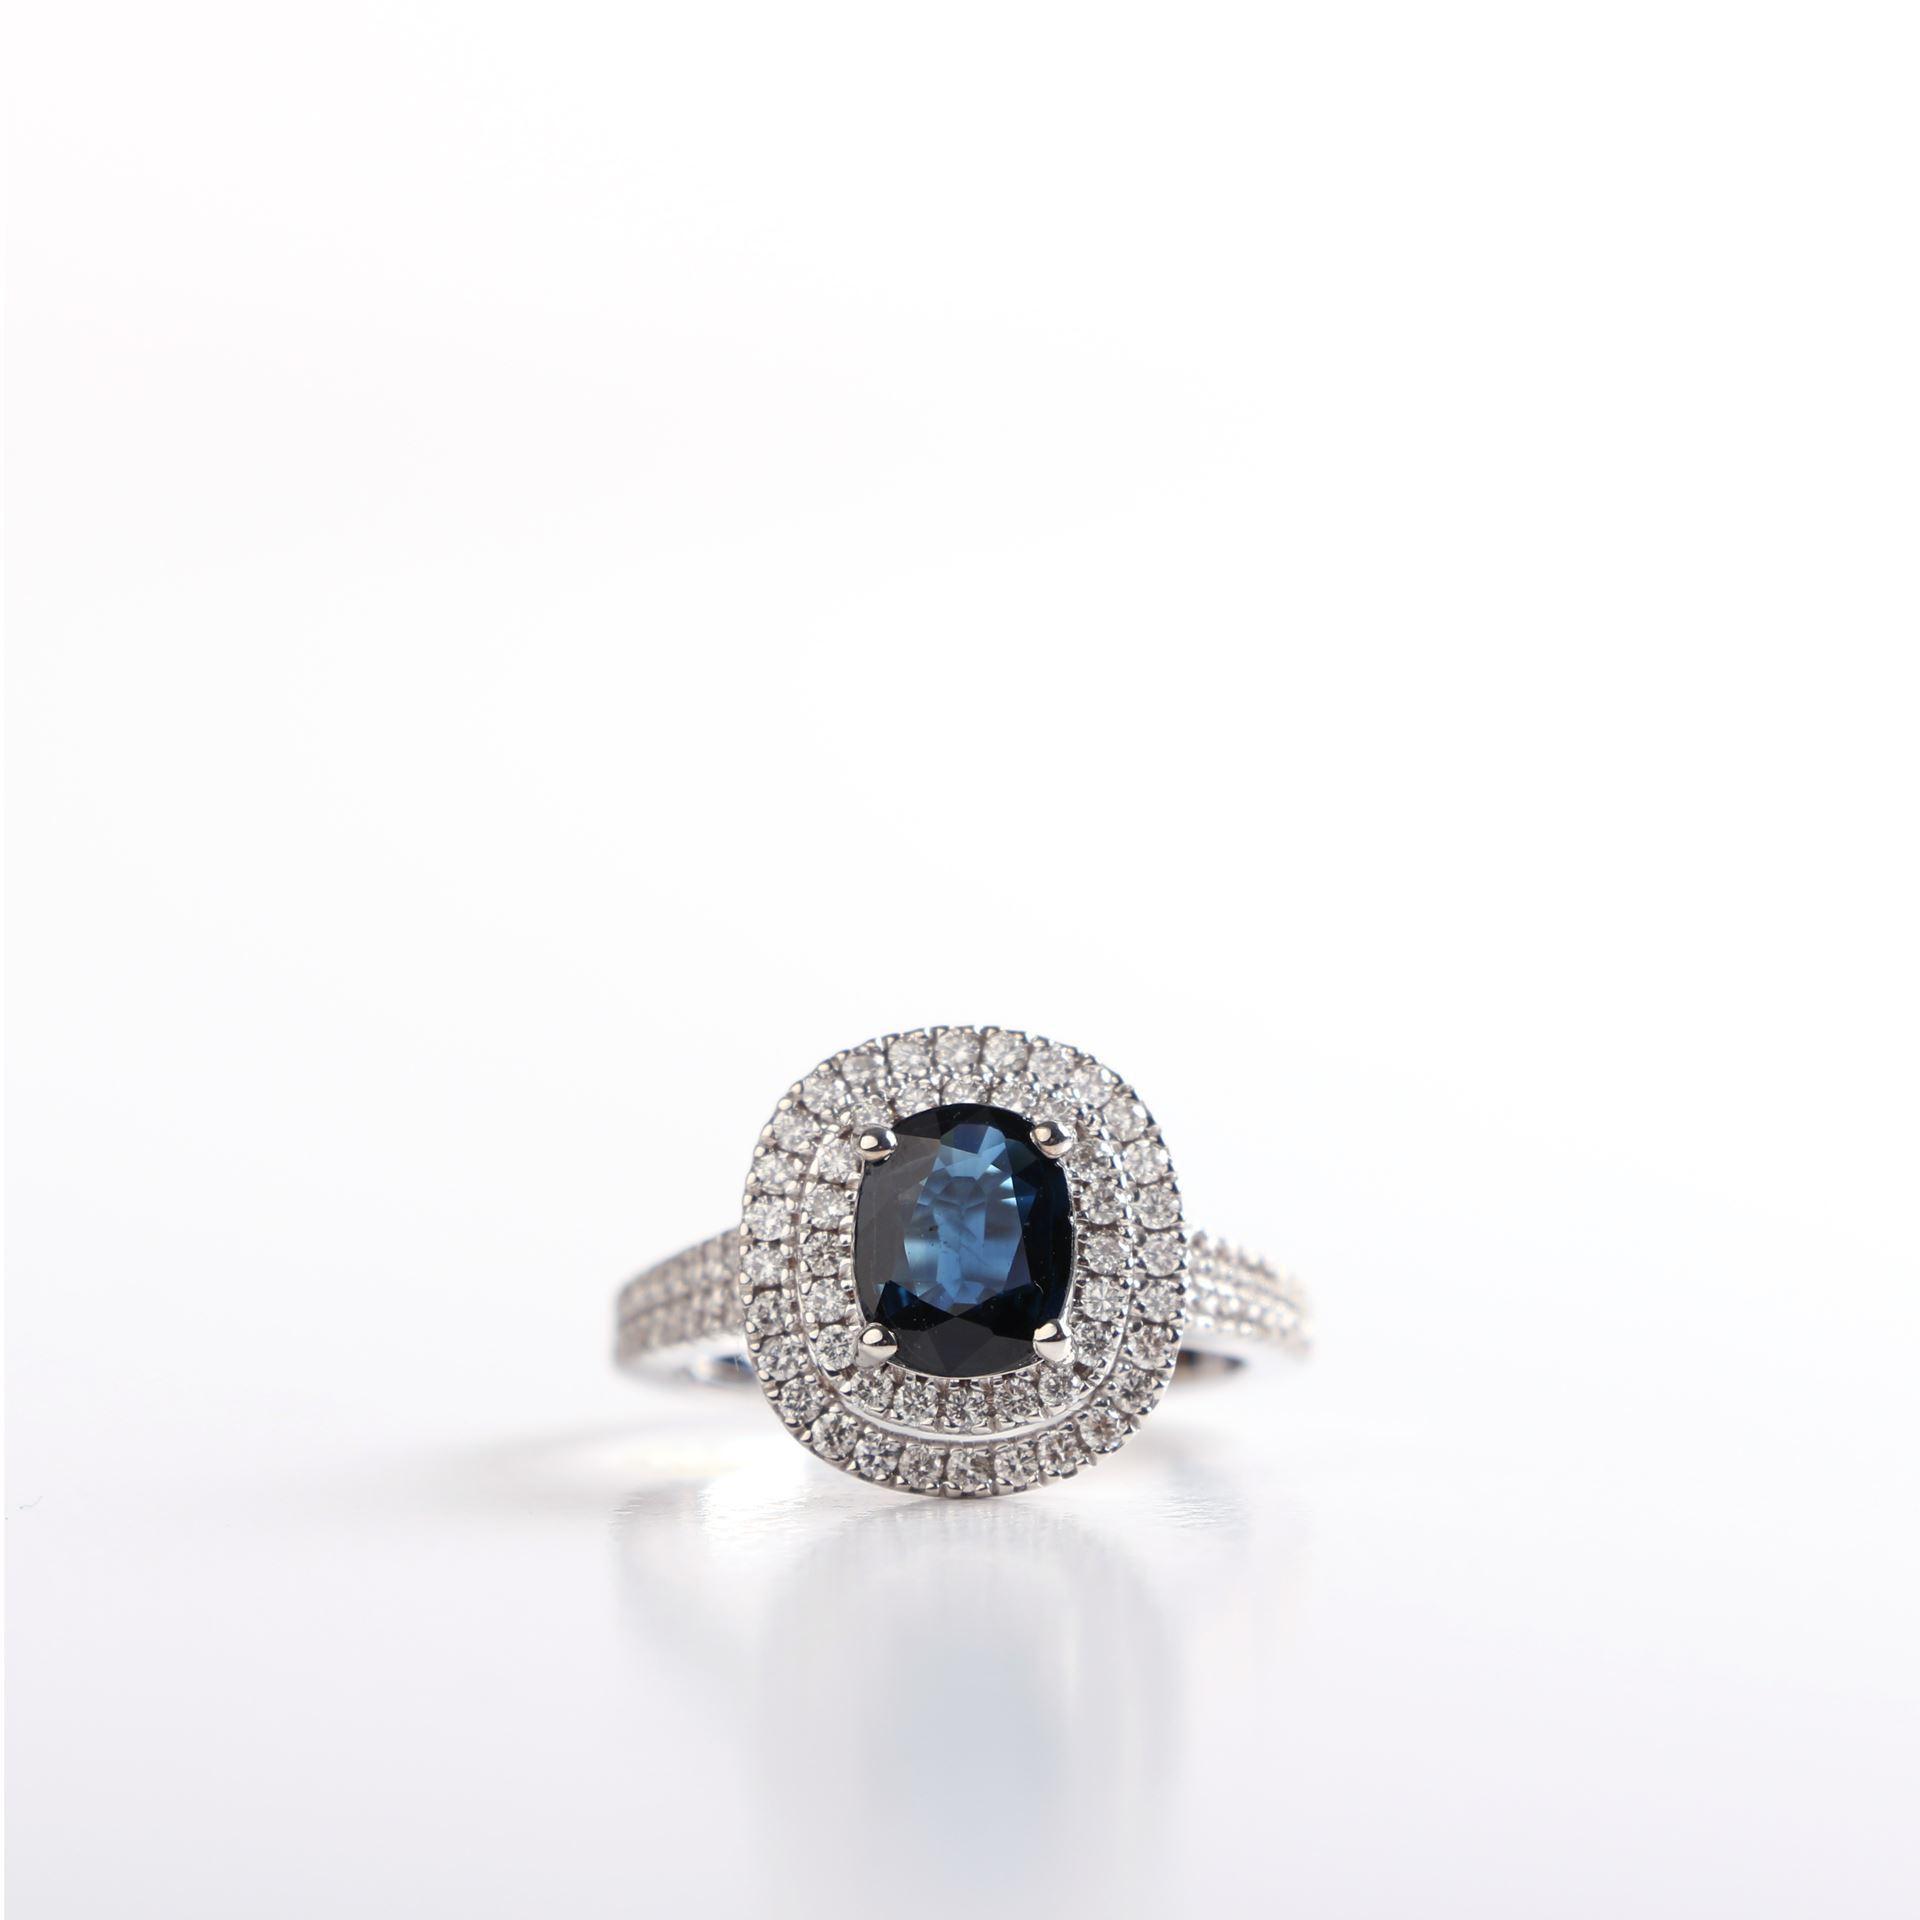 diamond genuine sapphire ring joud soutou jewelry. Black Bedroom Furniture Sets. Home Design Ideas